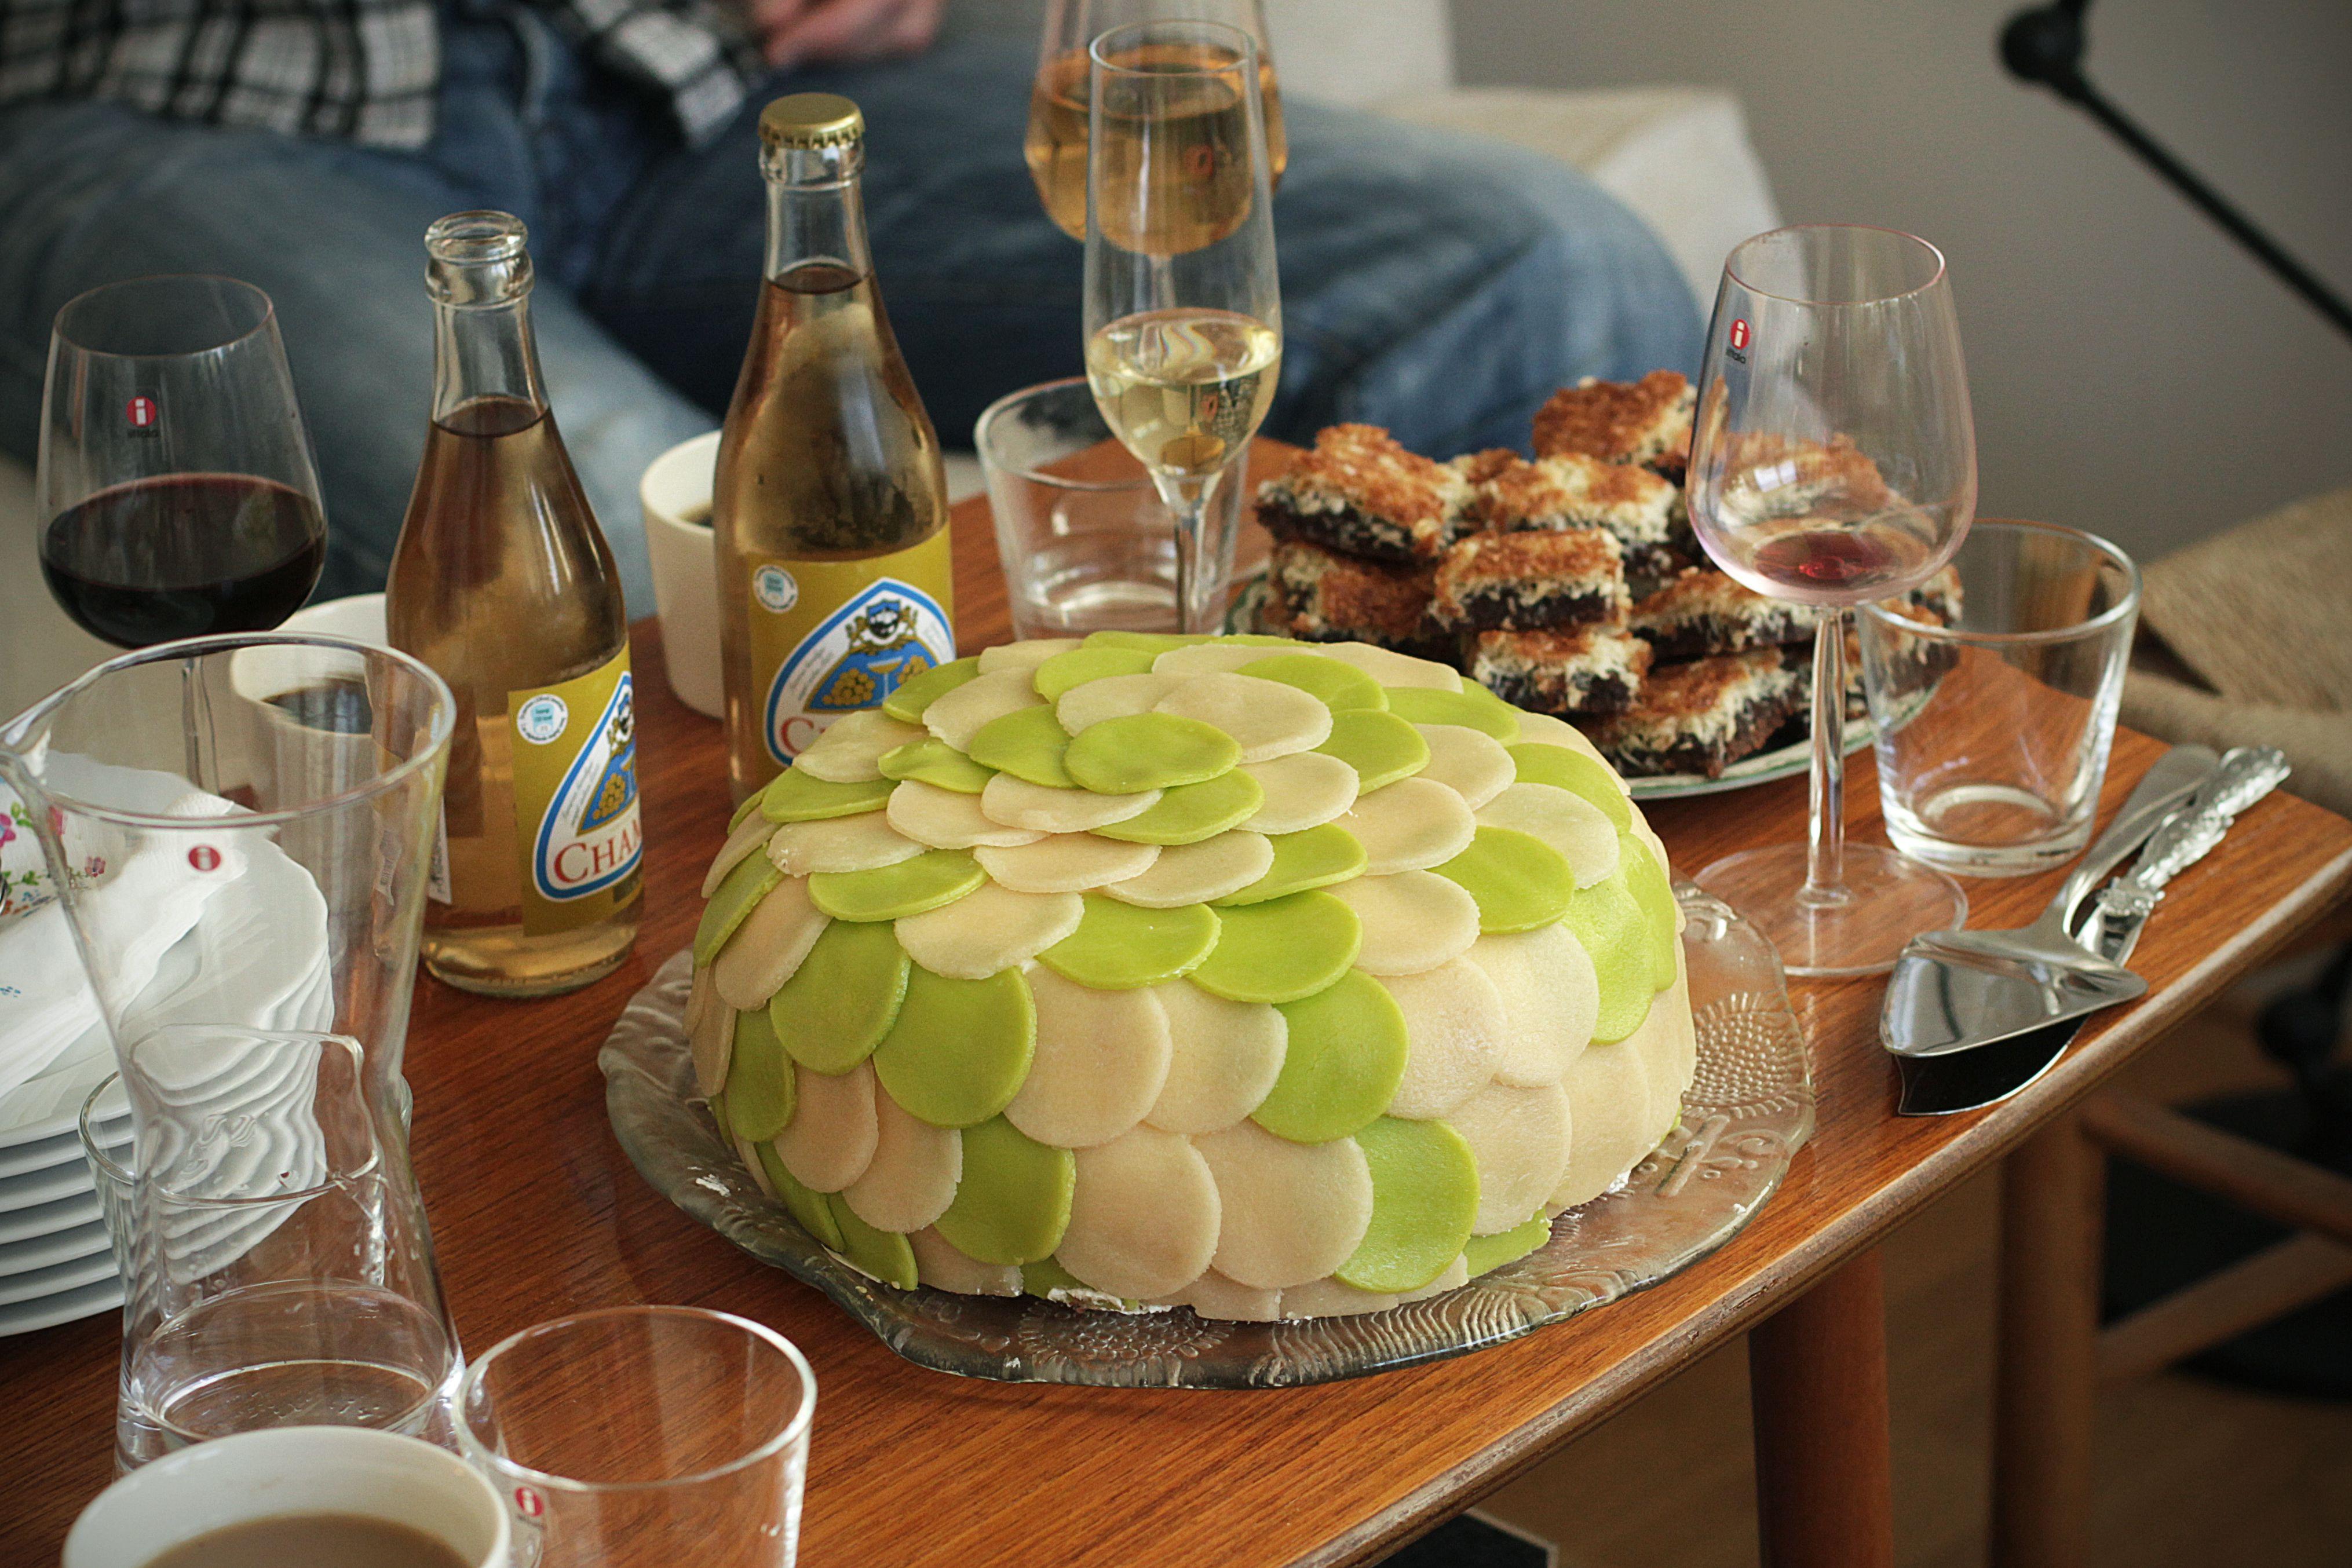 tårtor cakes design architecture shingles spån marzipan gateau party kalas tårta cake frosting champis